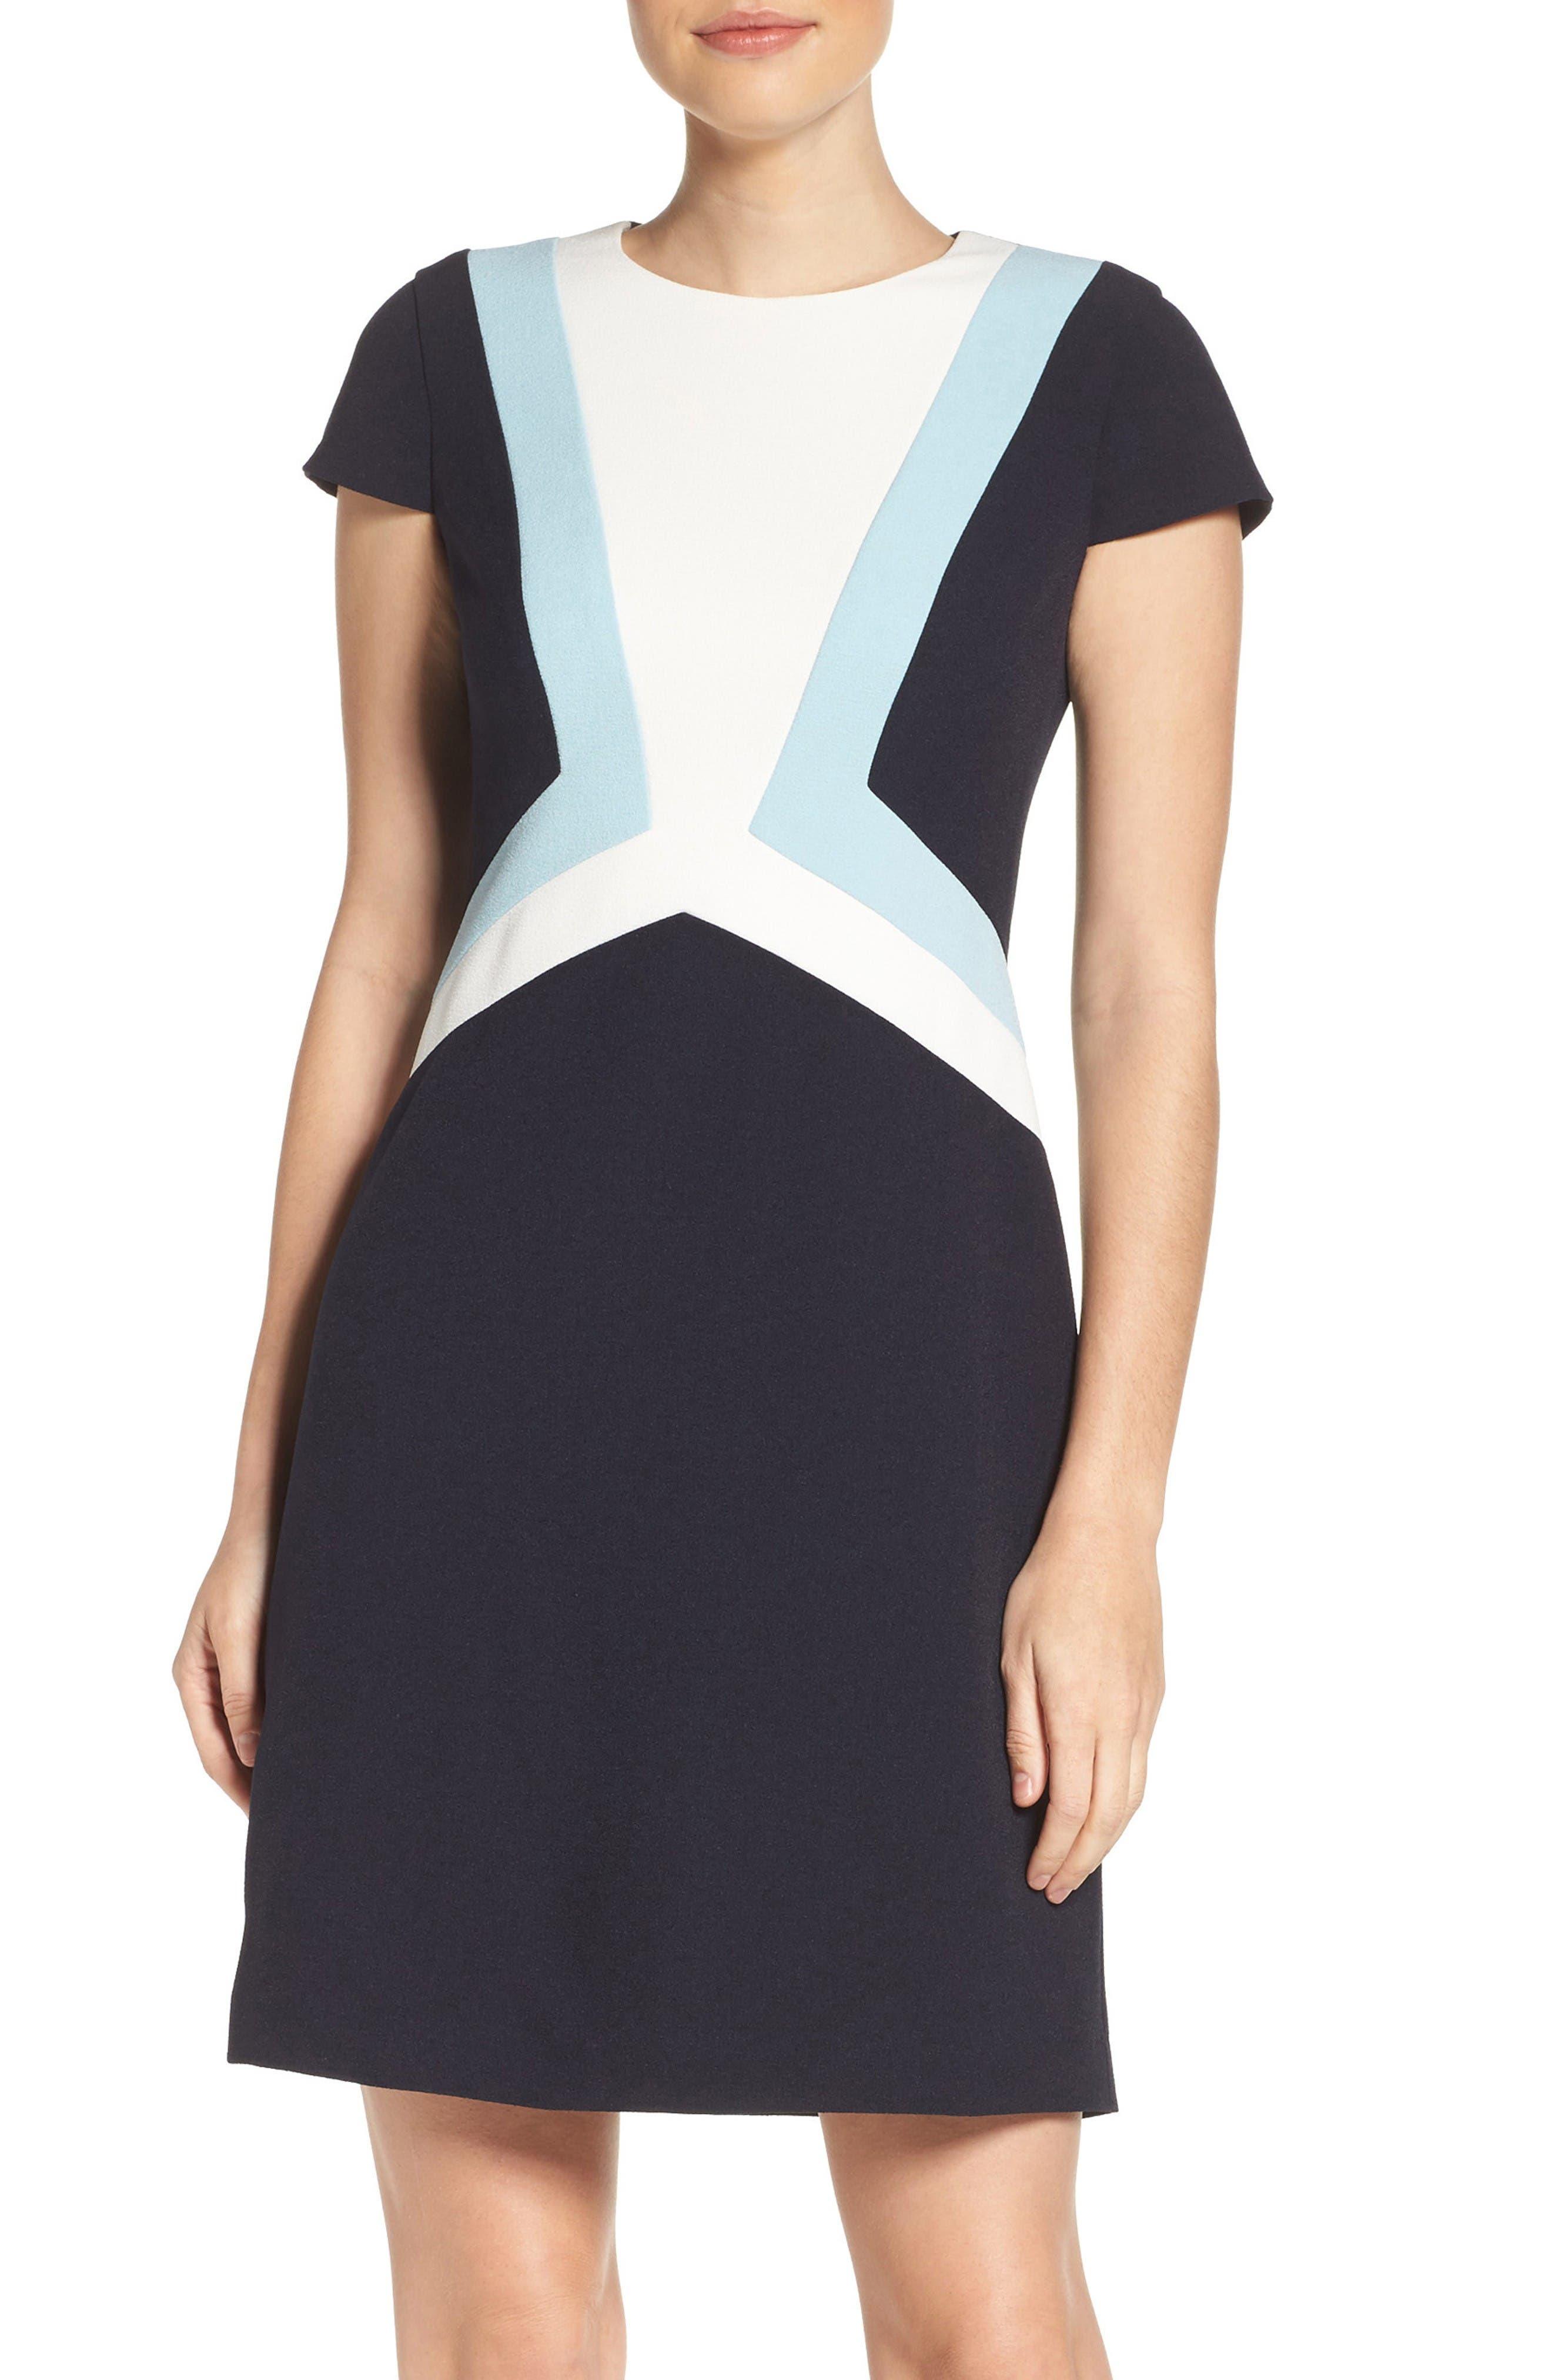 Alternate Image 1 Selected - Vince Camuto Colorblock Shift Dress (Regular & Petite)